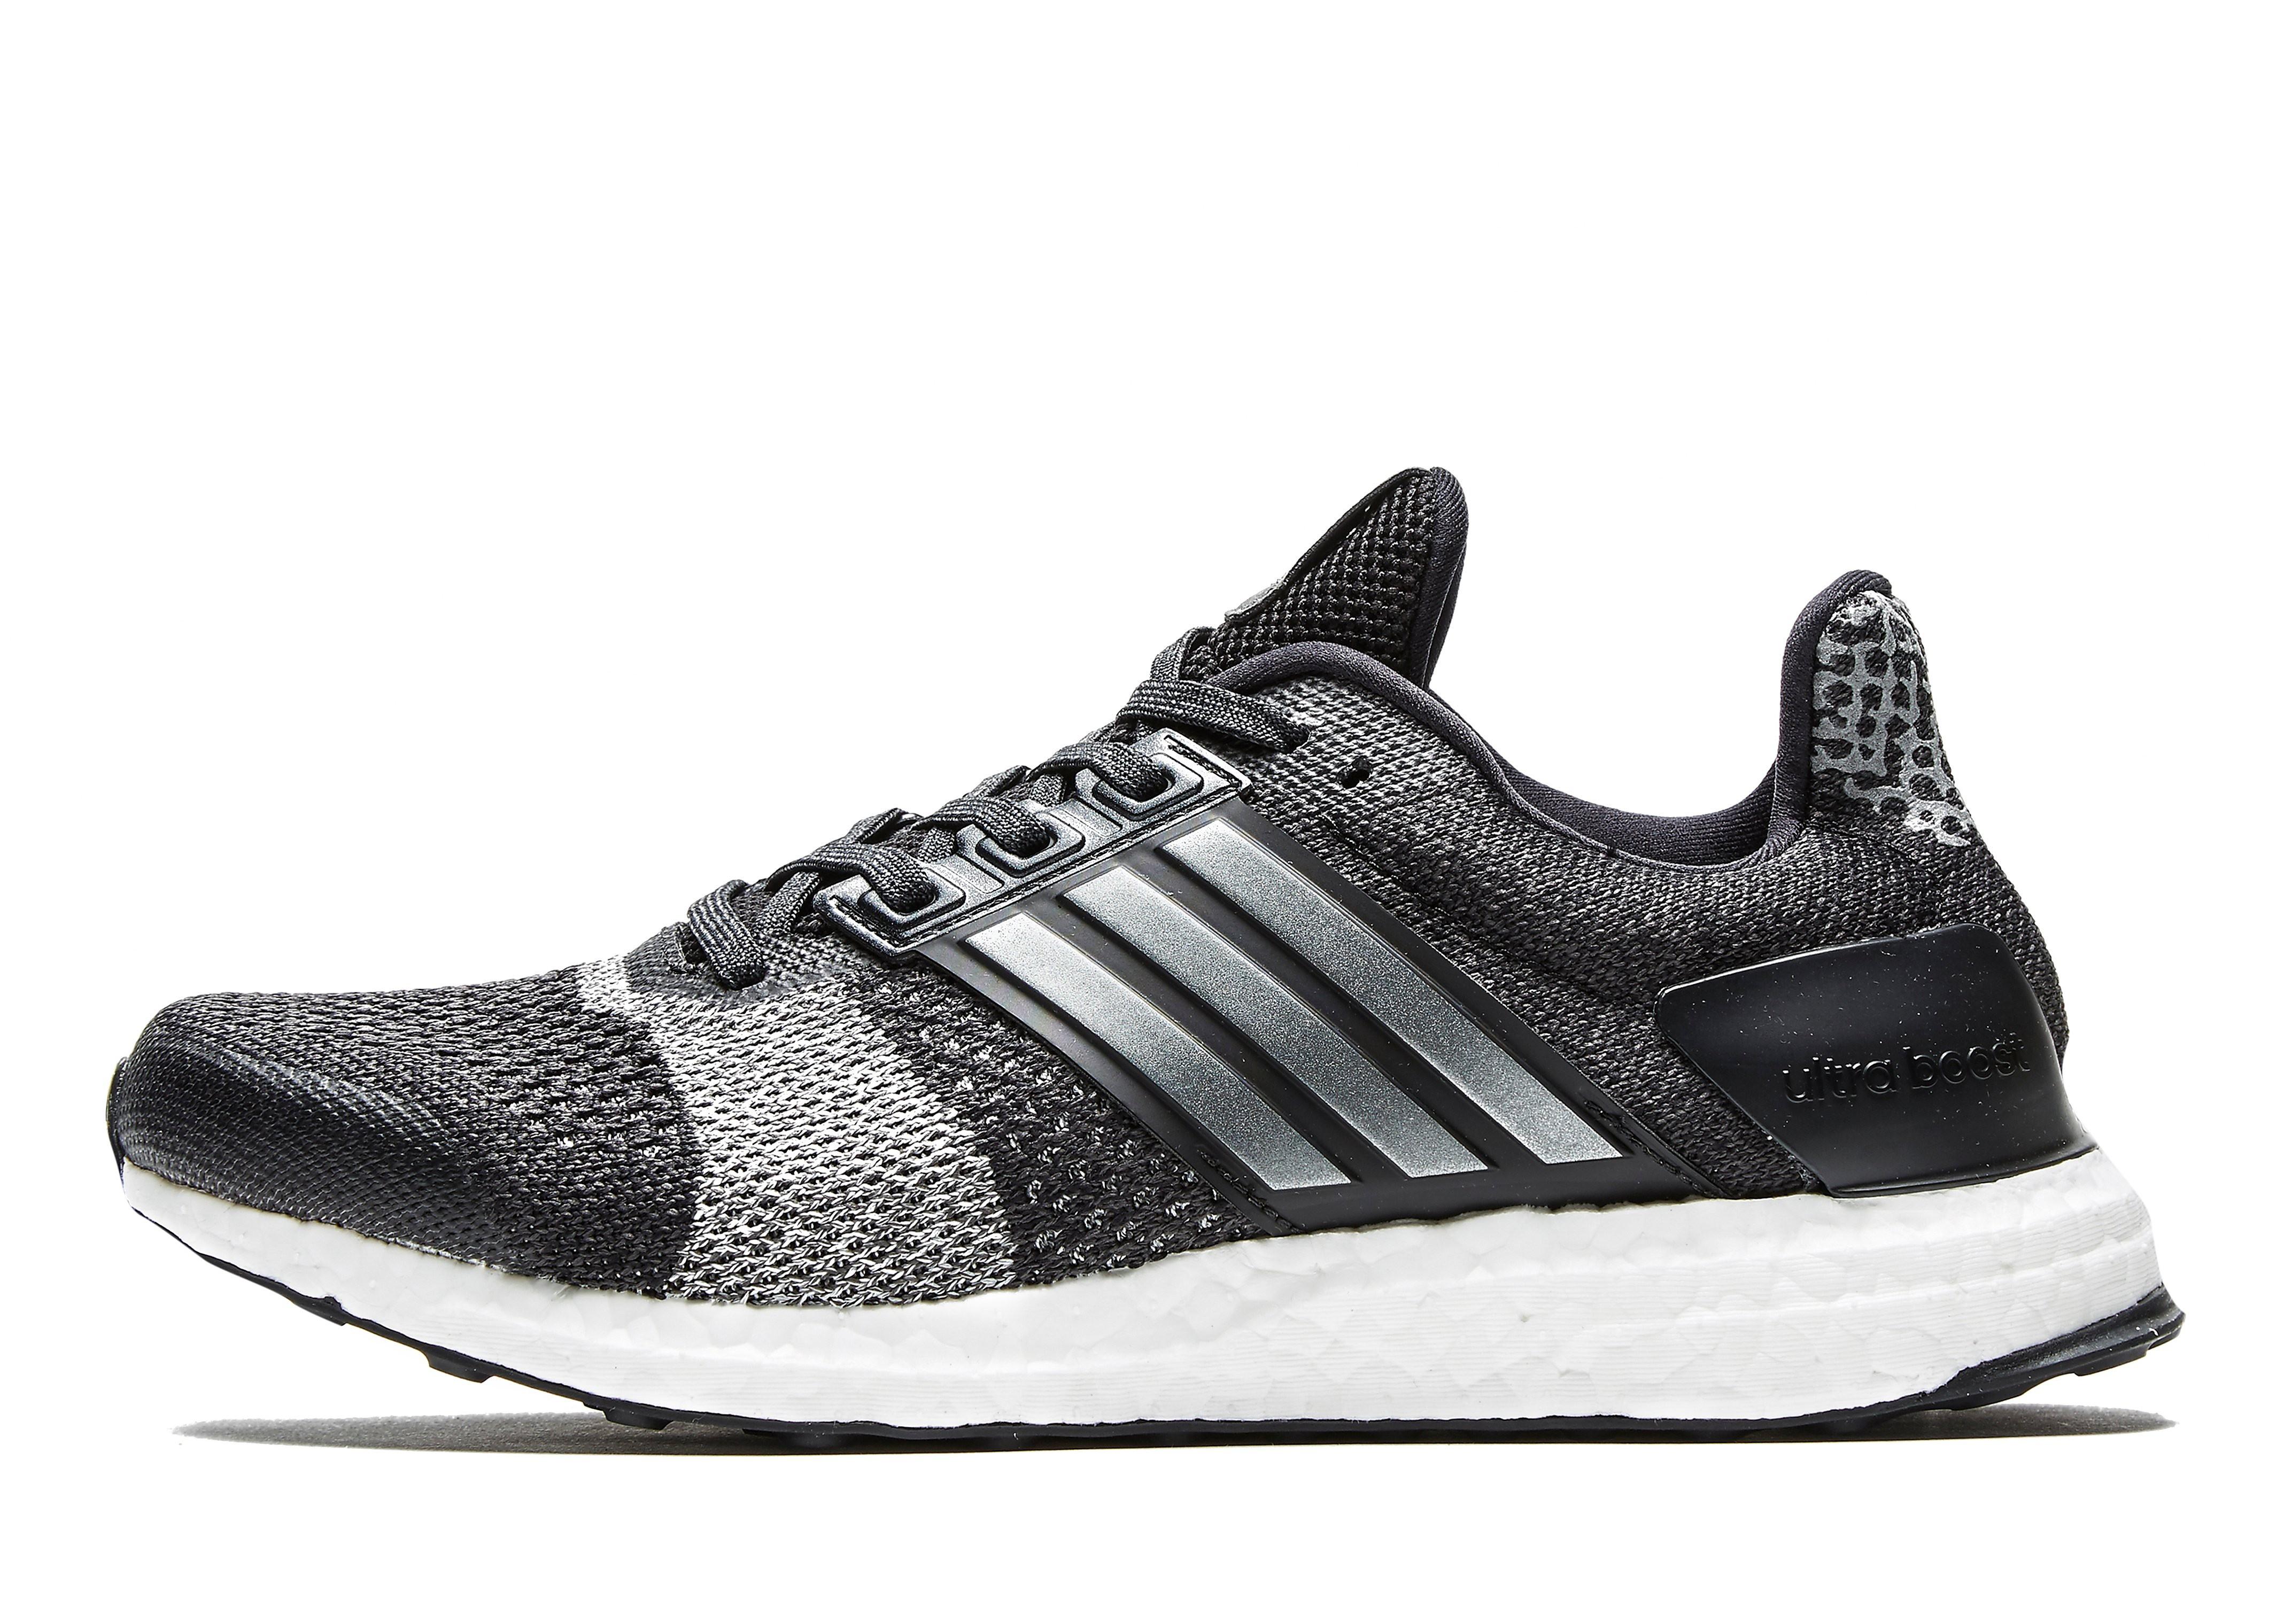 adidas Ultra Boost ST Men's Running Shoes